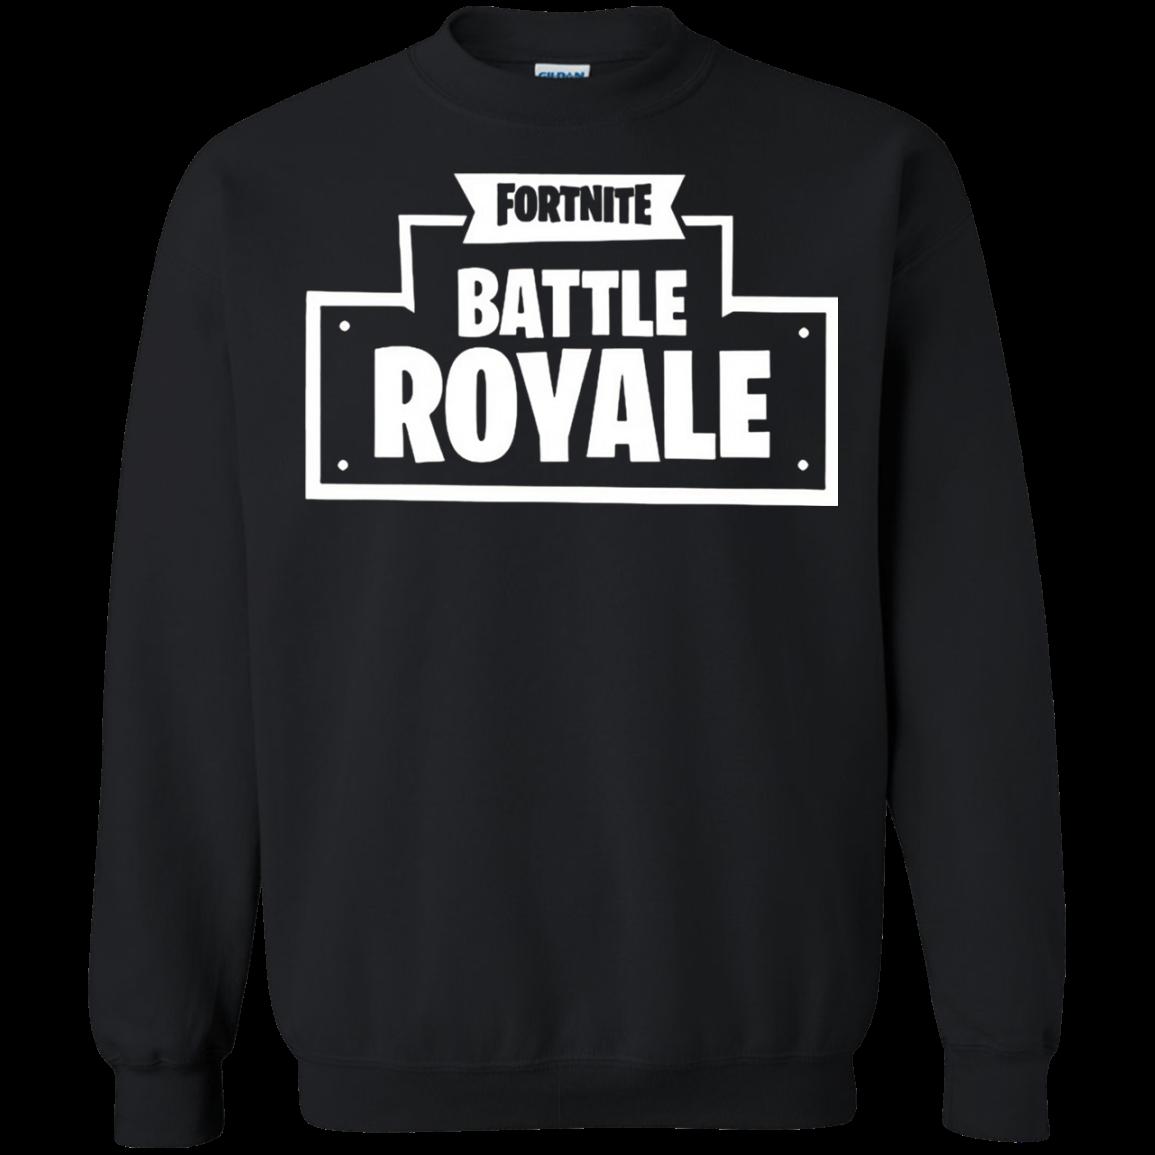 c3d0737c59 Fortnite Battle Royale T shirt Hoodie Sweater   Fortnite   Sweater ...